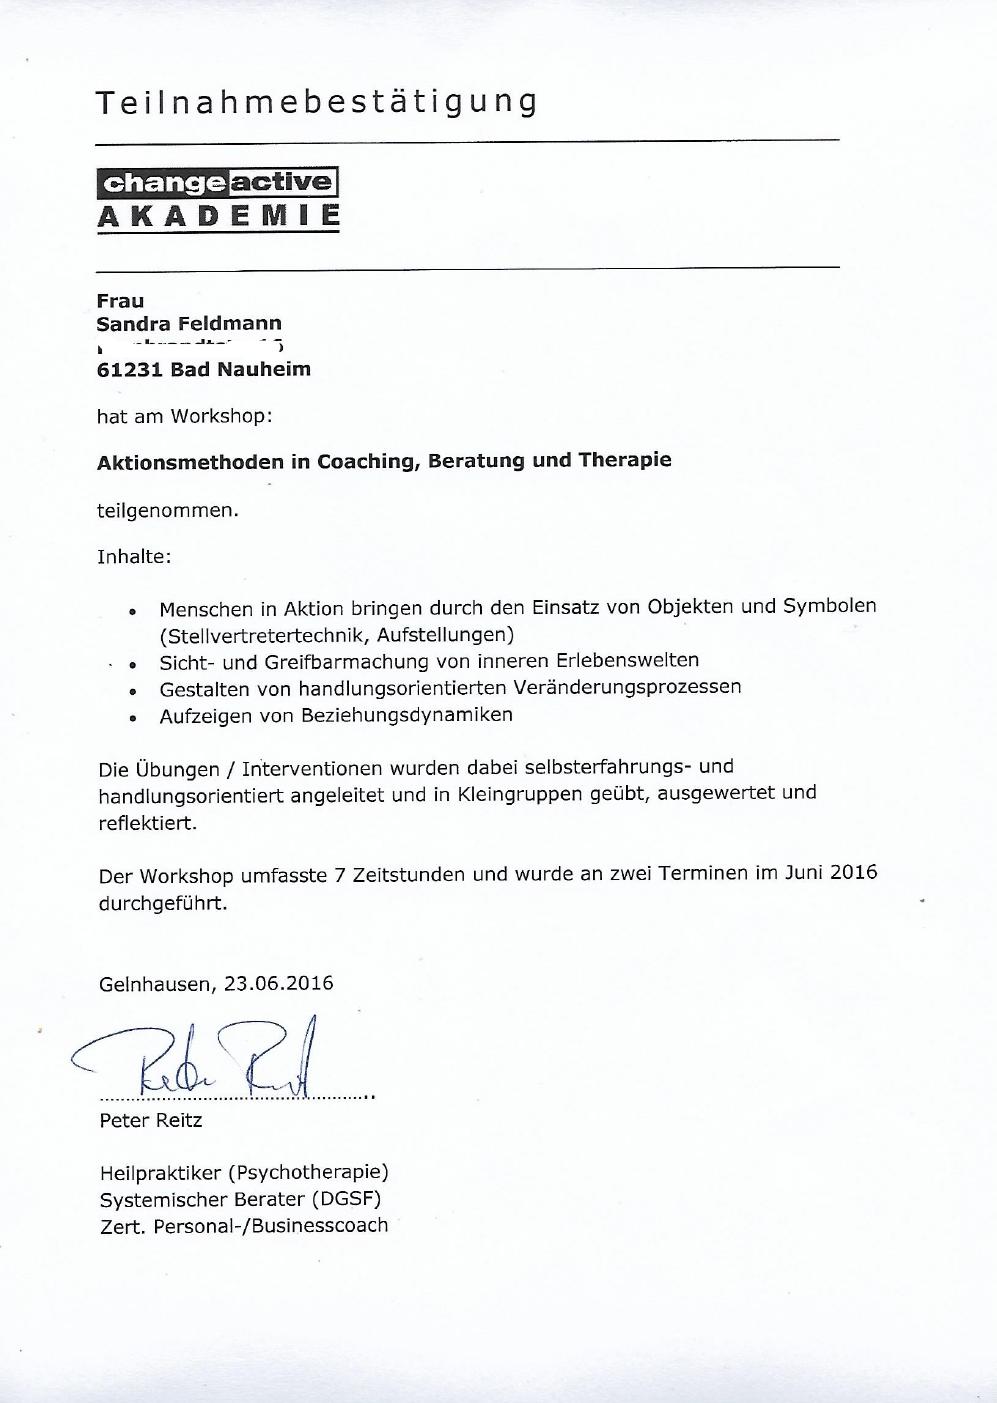 Aktionsmethoden in Coaching, Beratung und Therapie, change active Akademie